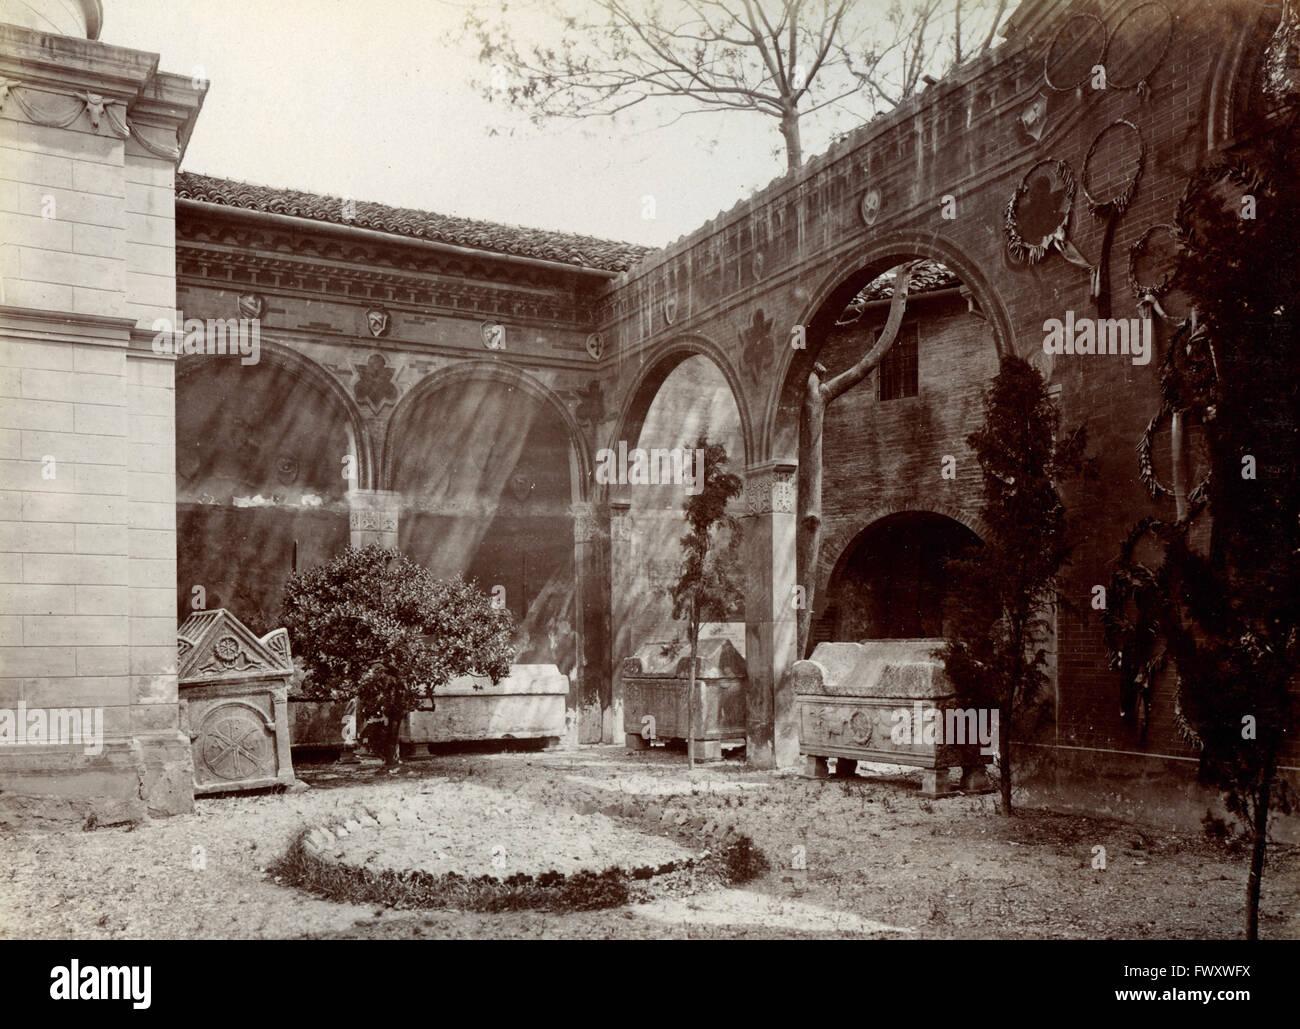 The burial ground of Braccioforte, Ravenna, Italy - Stock Image